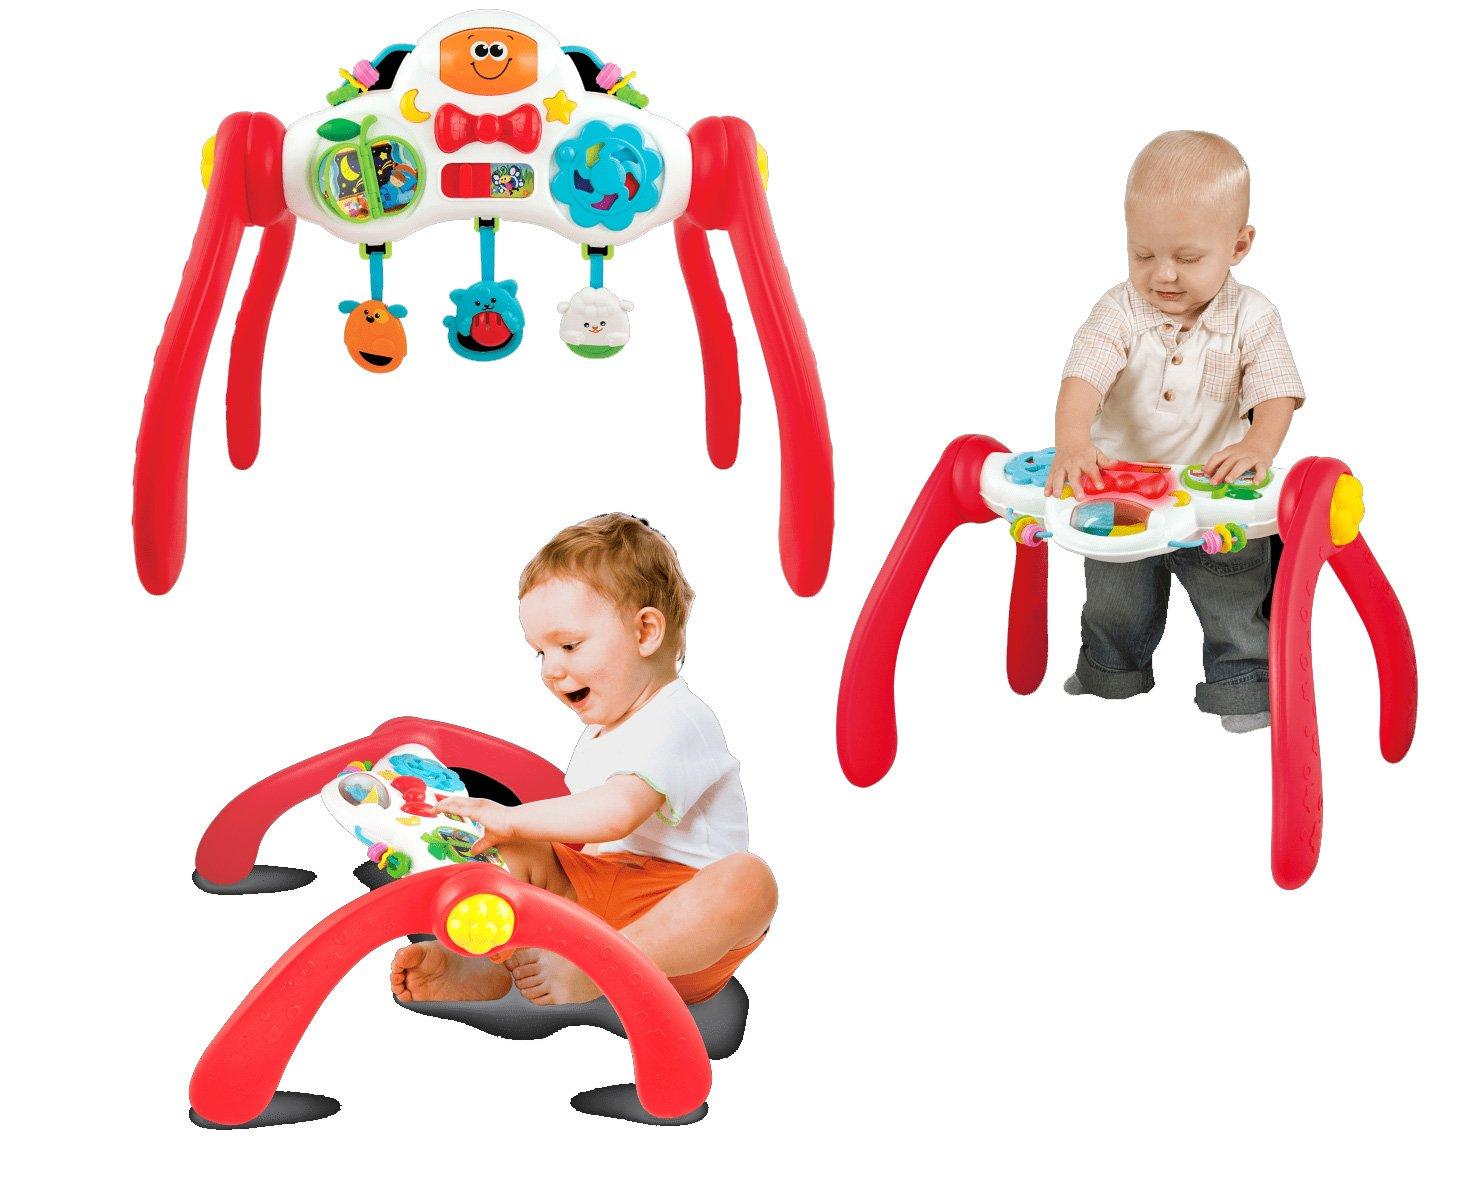 Winfun Baby Trainer Arche de Jeux Activity Center mitwachsend Table d'Apprentissage 3en 1avec son 000822-NL zurücksetzen